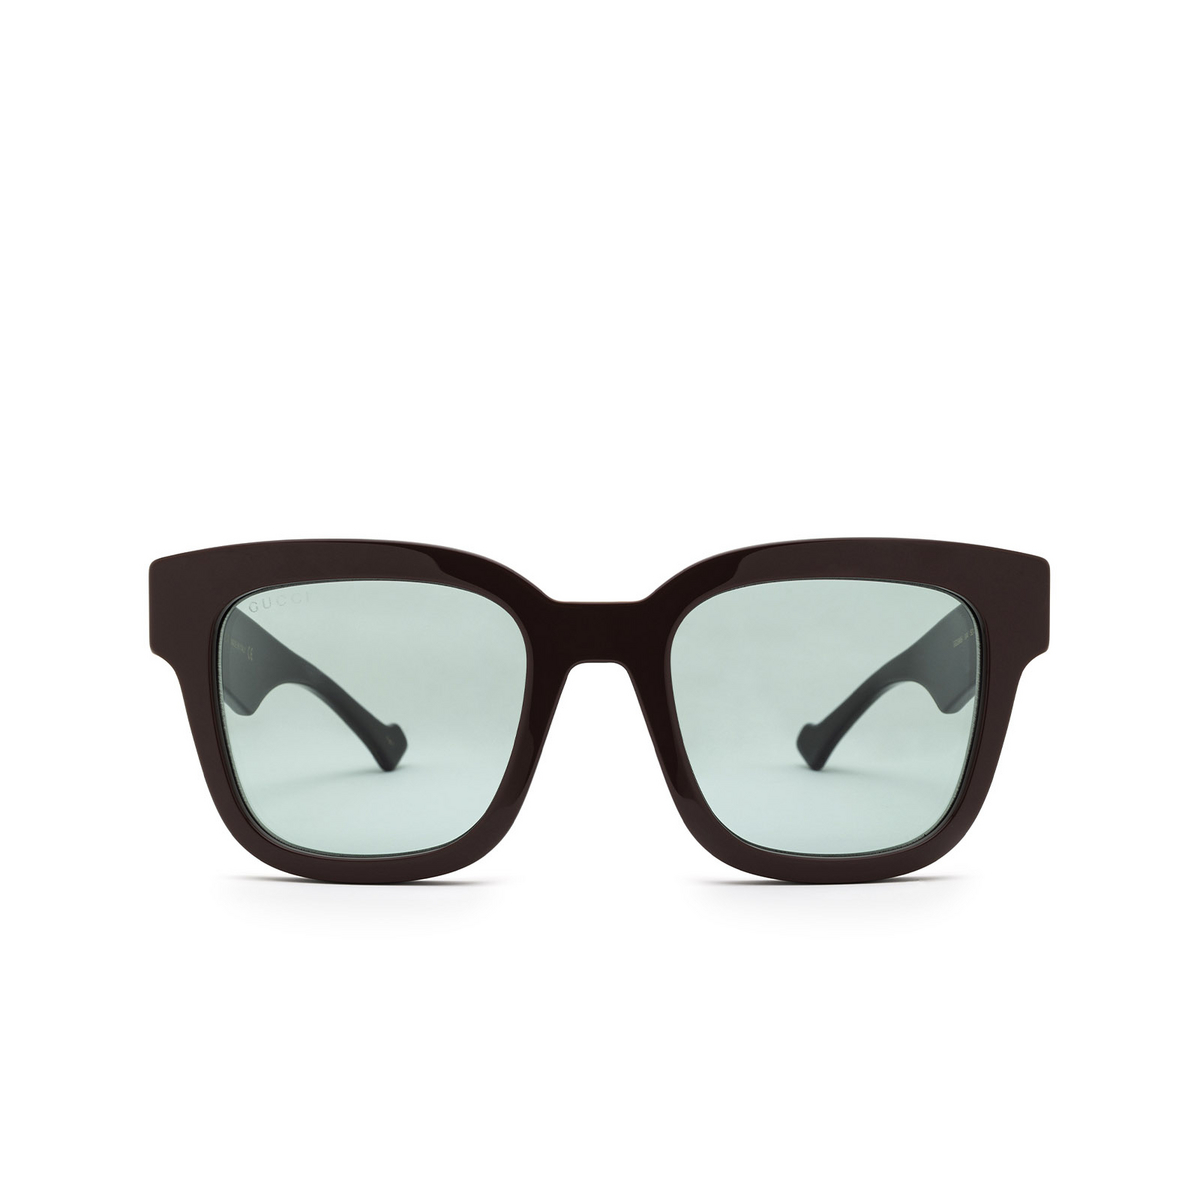 Gucci® Square Sunglasses: GG0998S color Brown 004 - front view.